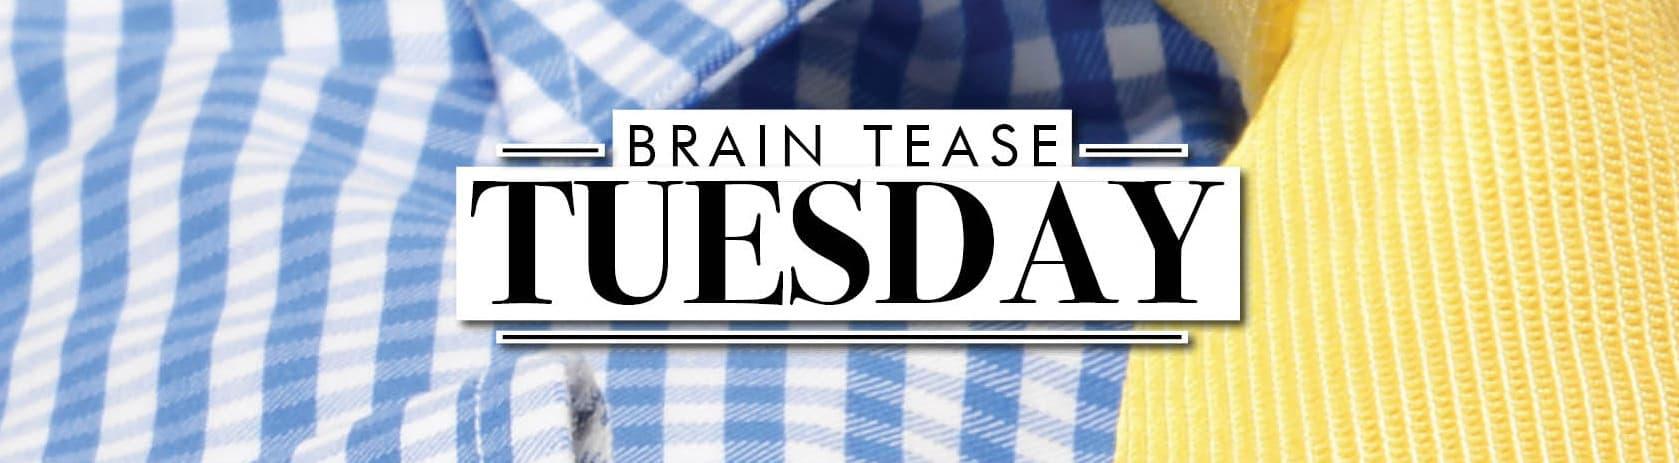 Brain Tease Tuesday Week 21